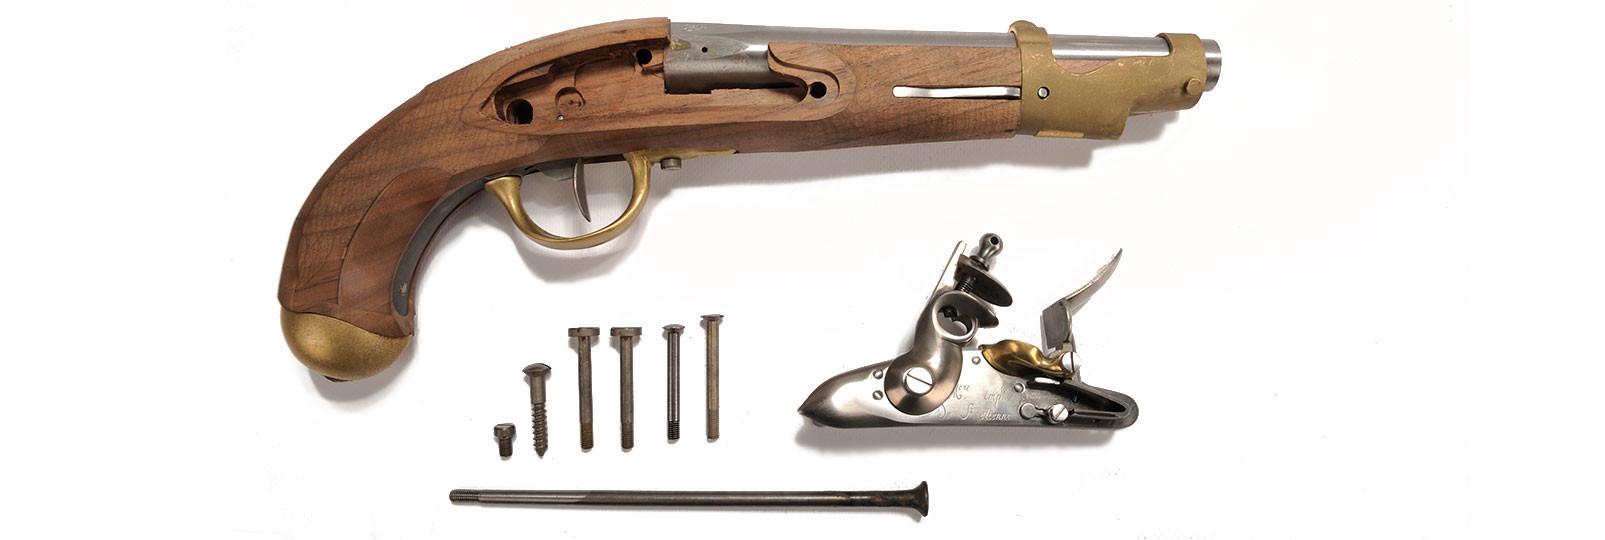 An IX pistol kit